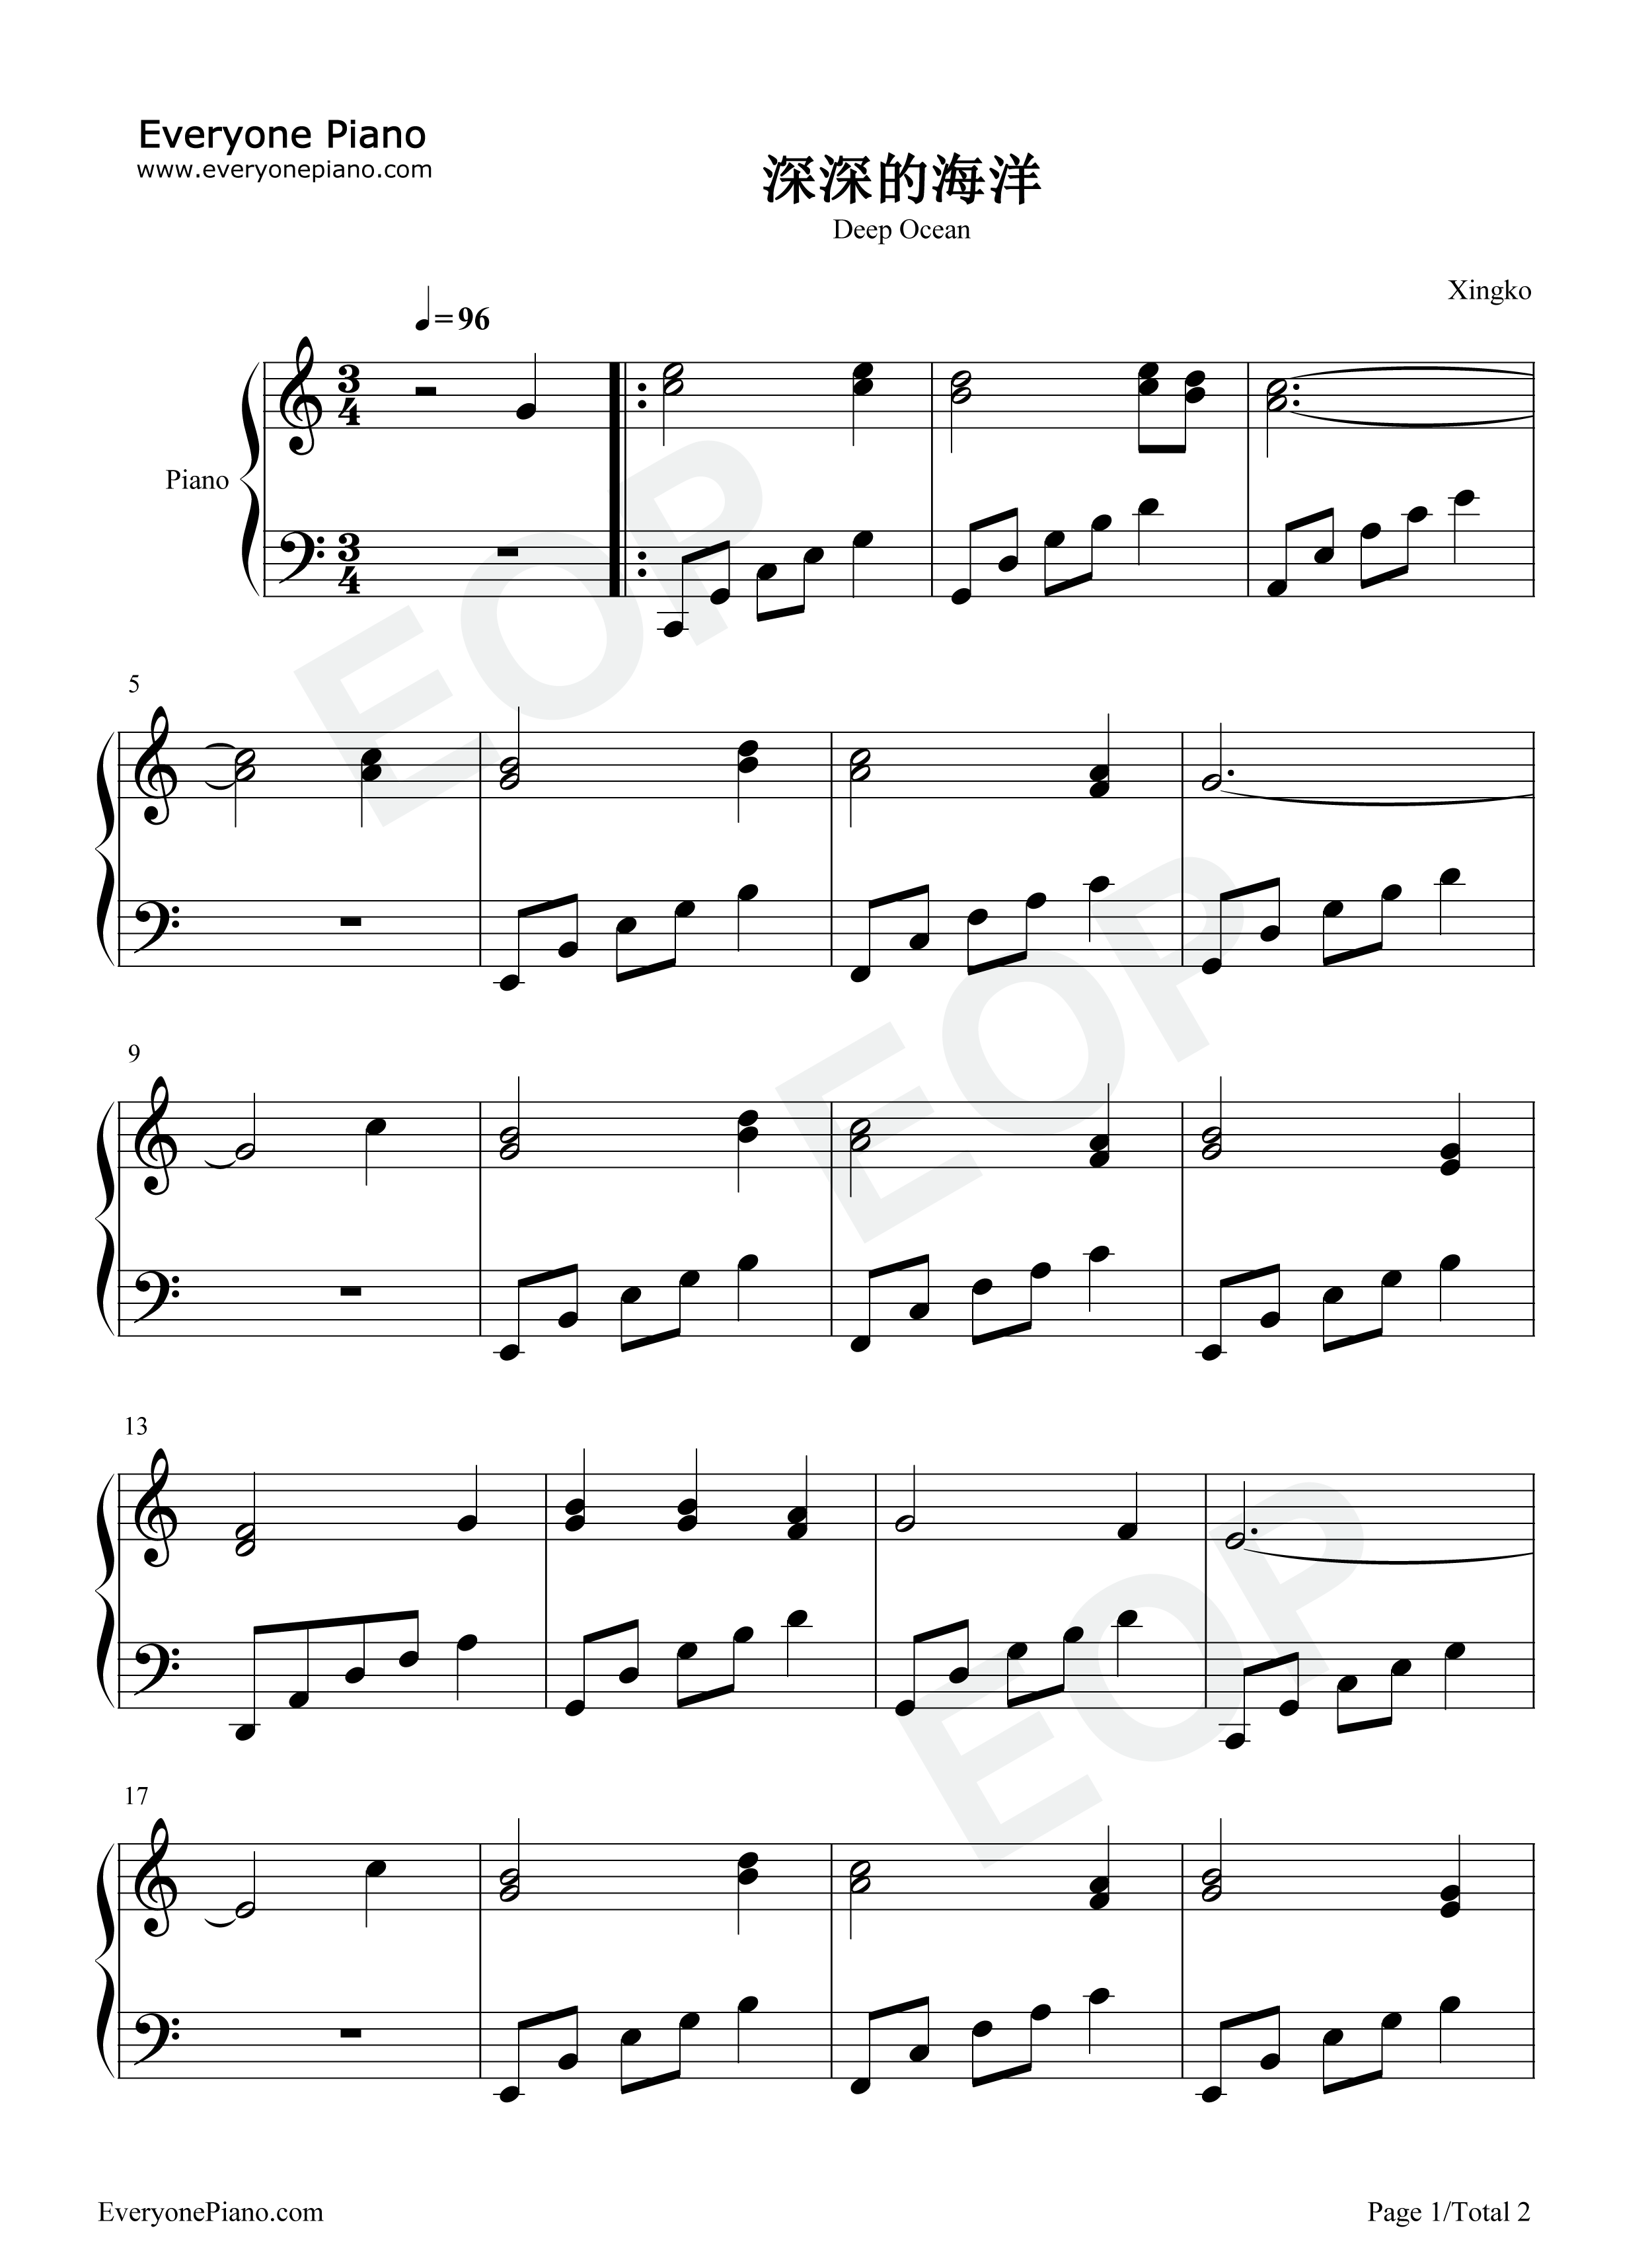 Deep Ocean-Yugoslav Folk Song Stave Preview 1-Free Piano Sheet Music u0026 Piano Chords